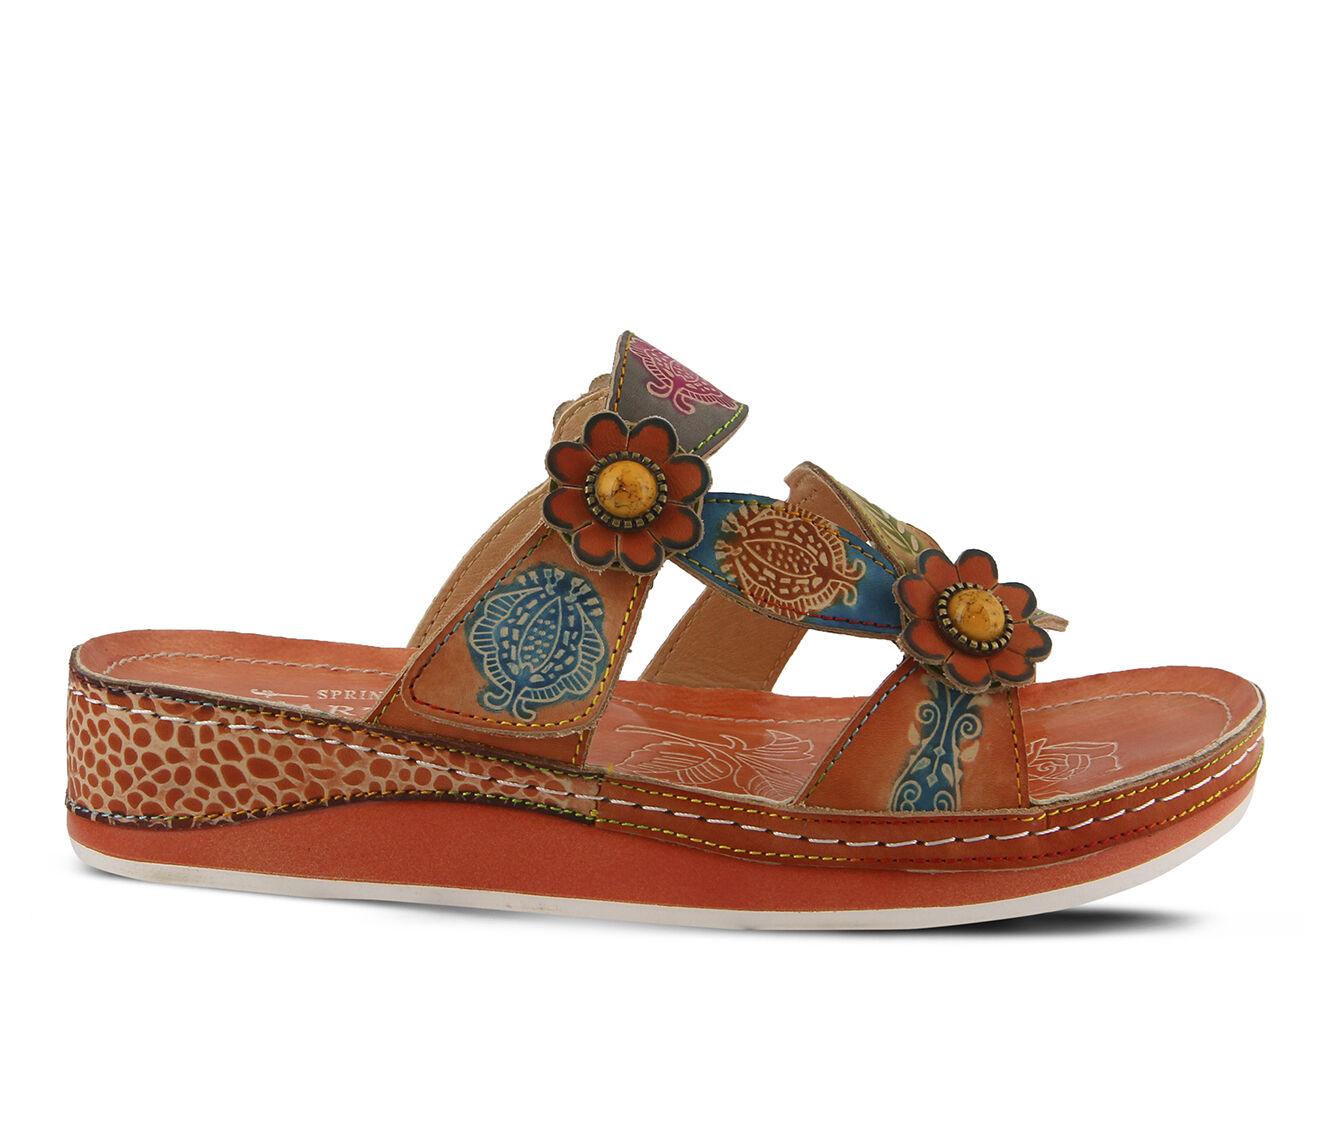 uk shoes_kd6626